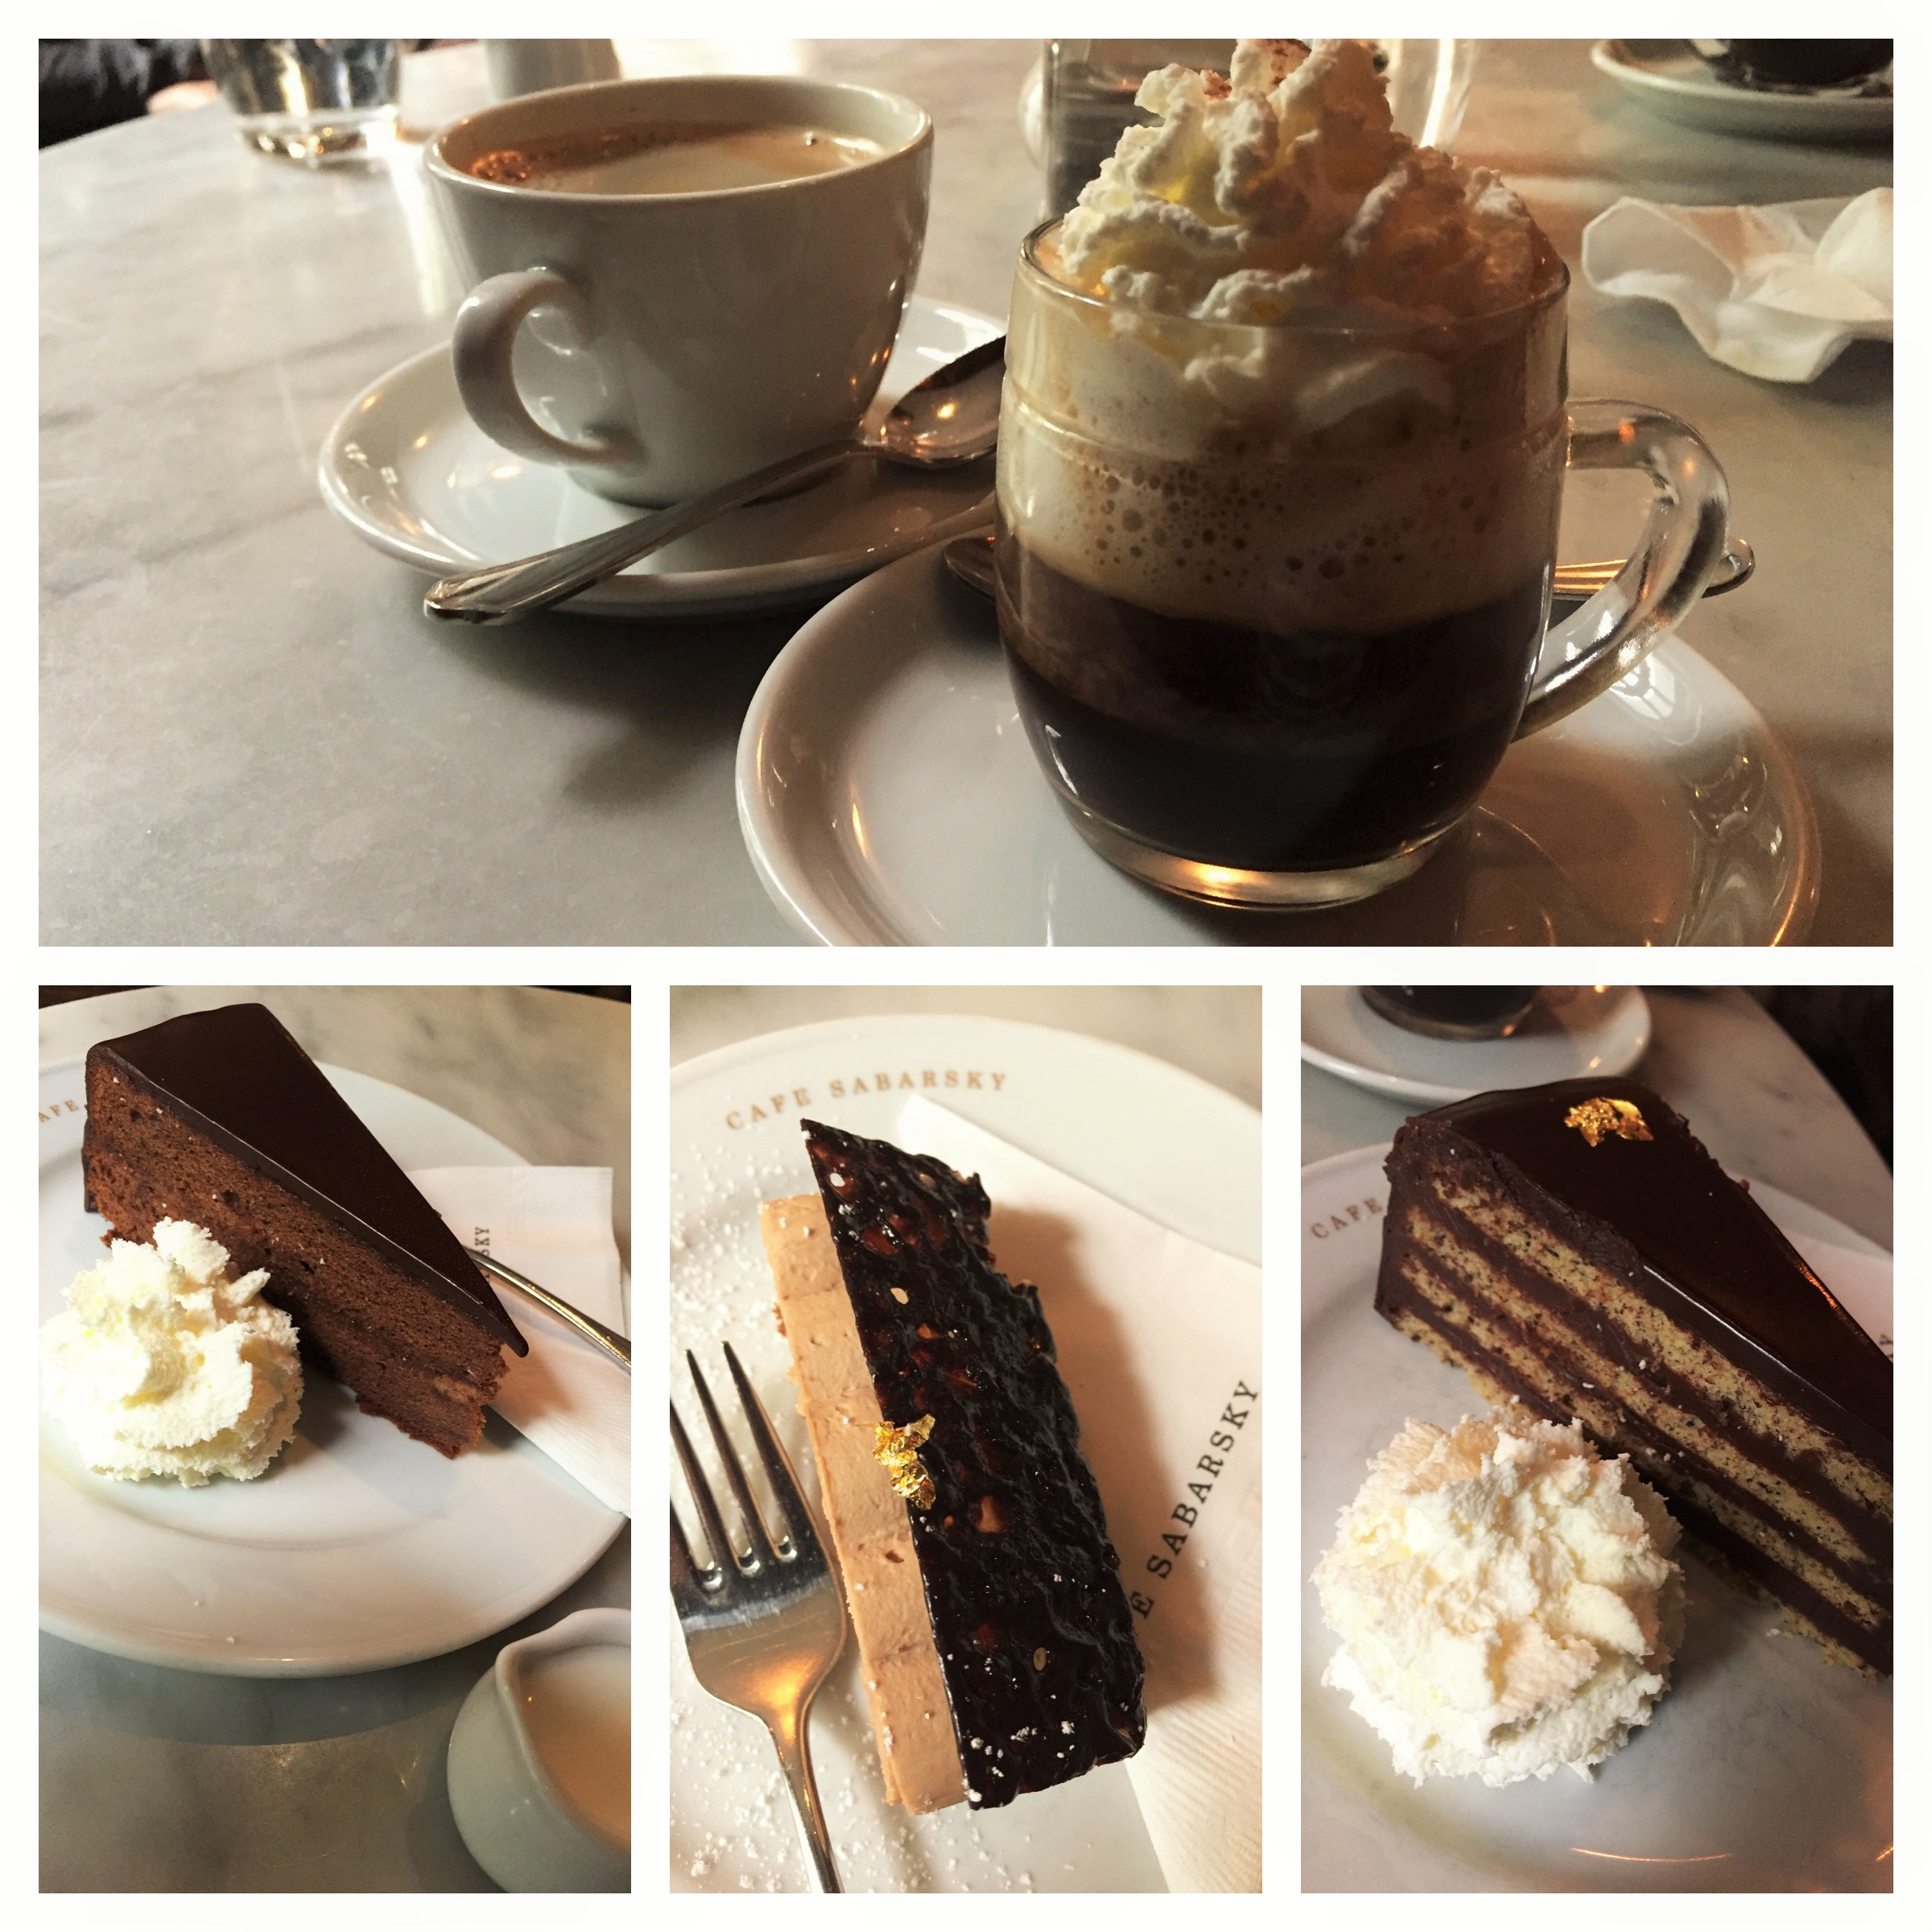 Cafe Sabarsky on 5th Avenue